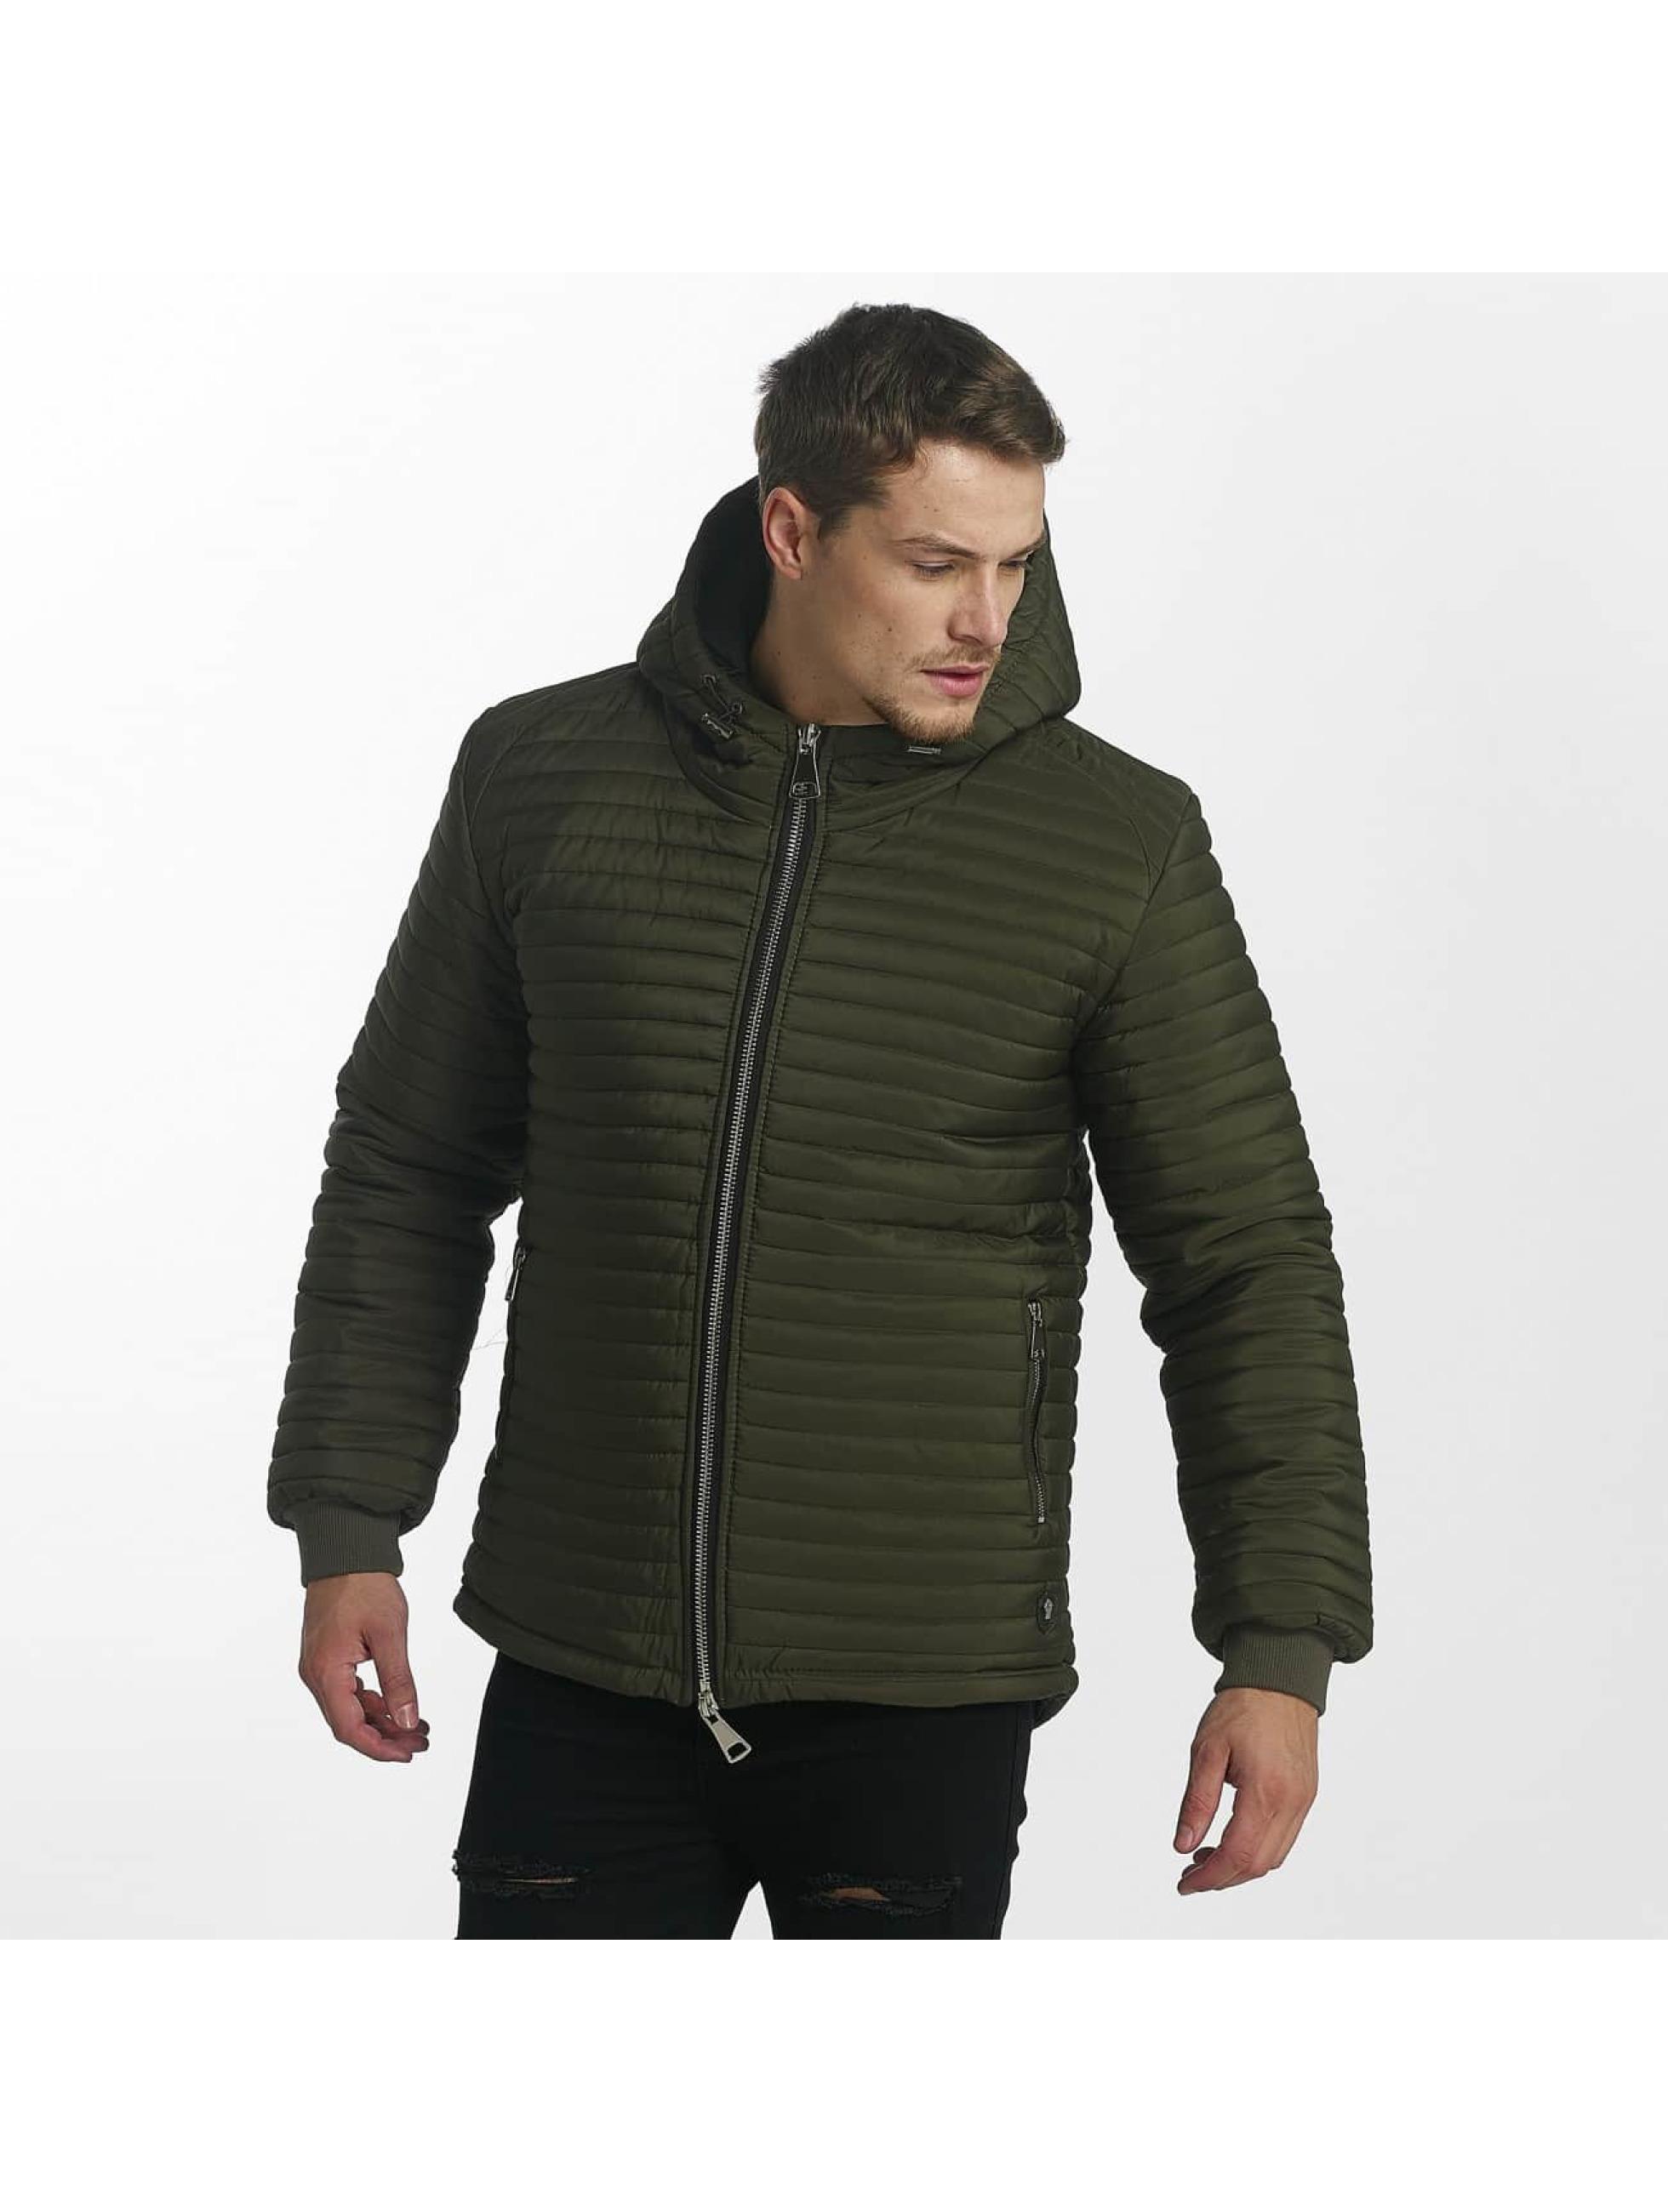 Uniplay Bomber jacket Avignon khaki